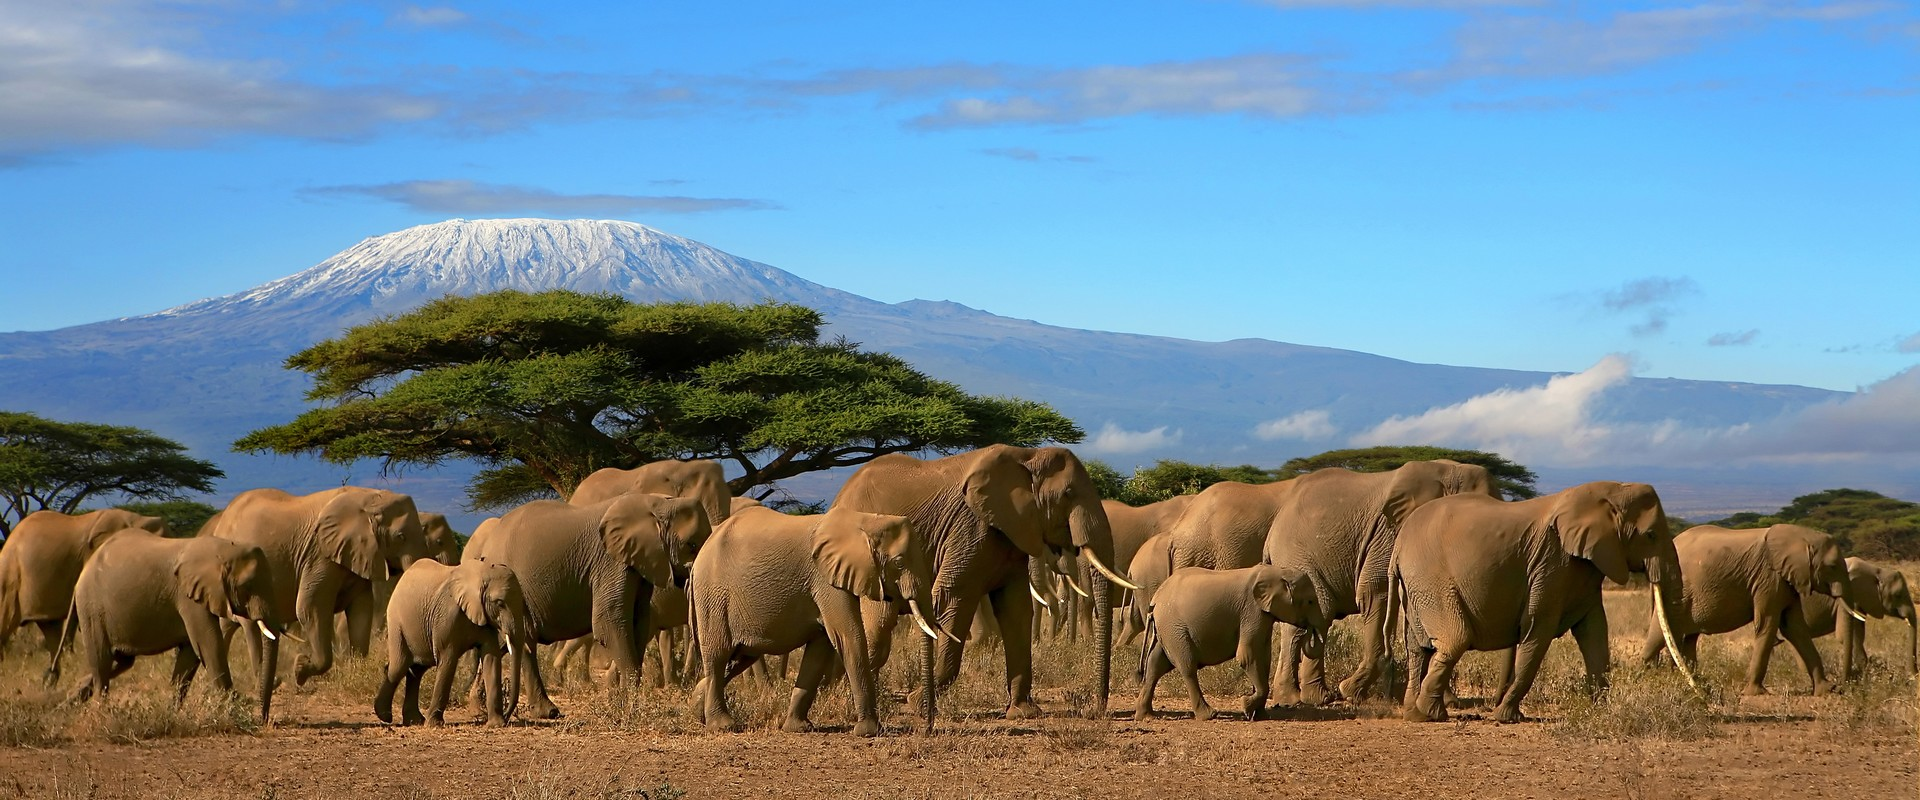 Амбосели. Стадо слонов